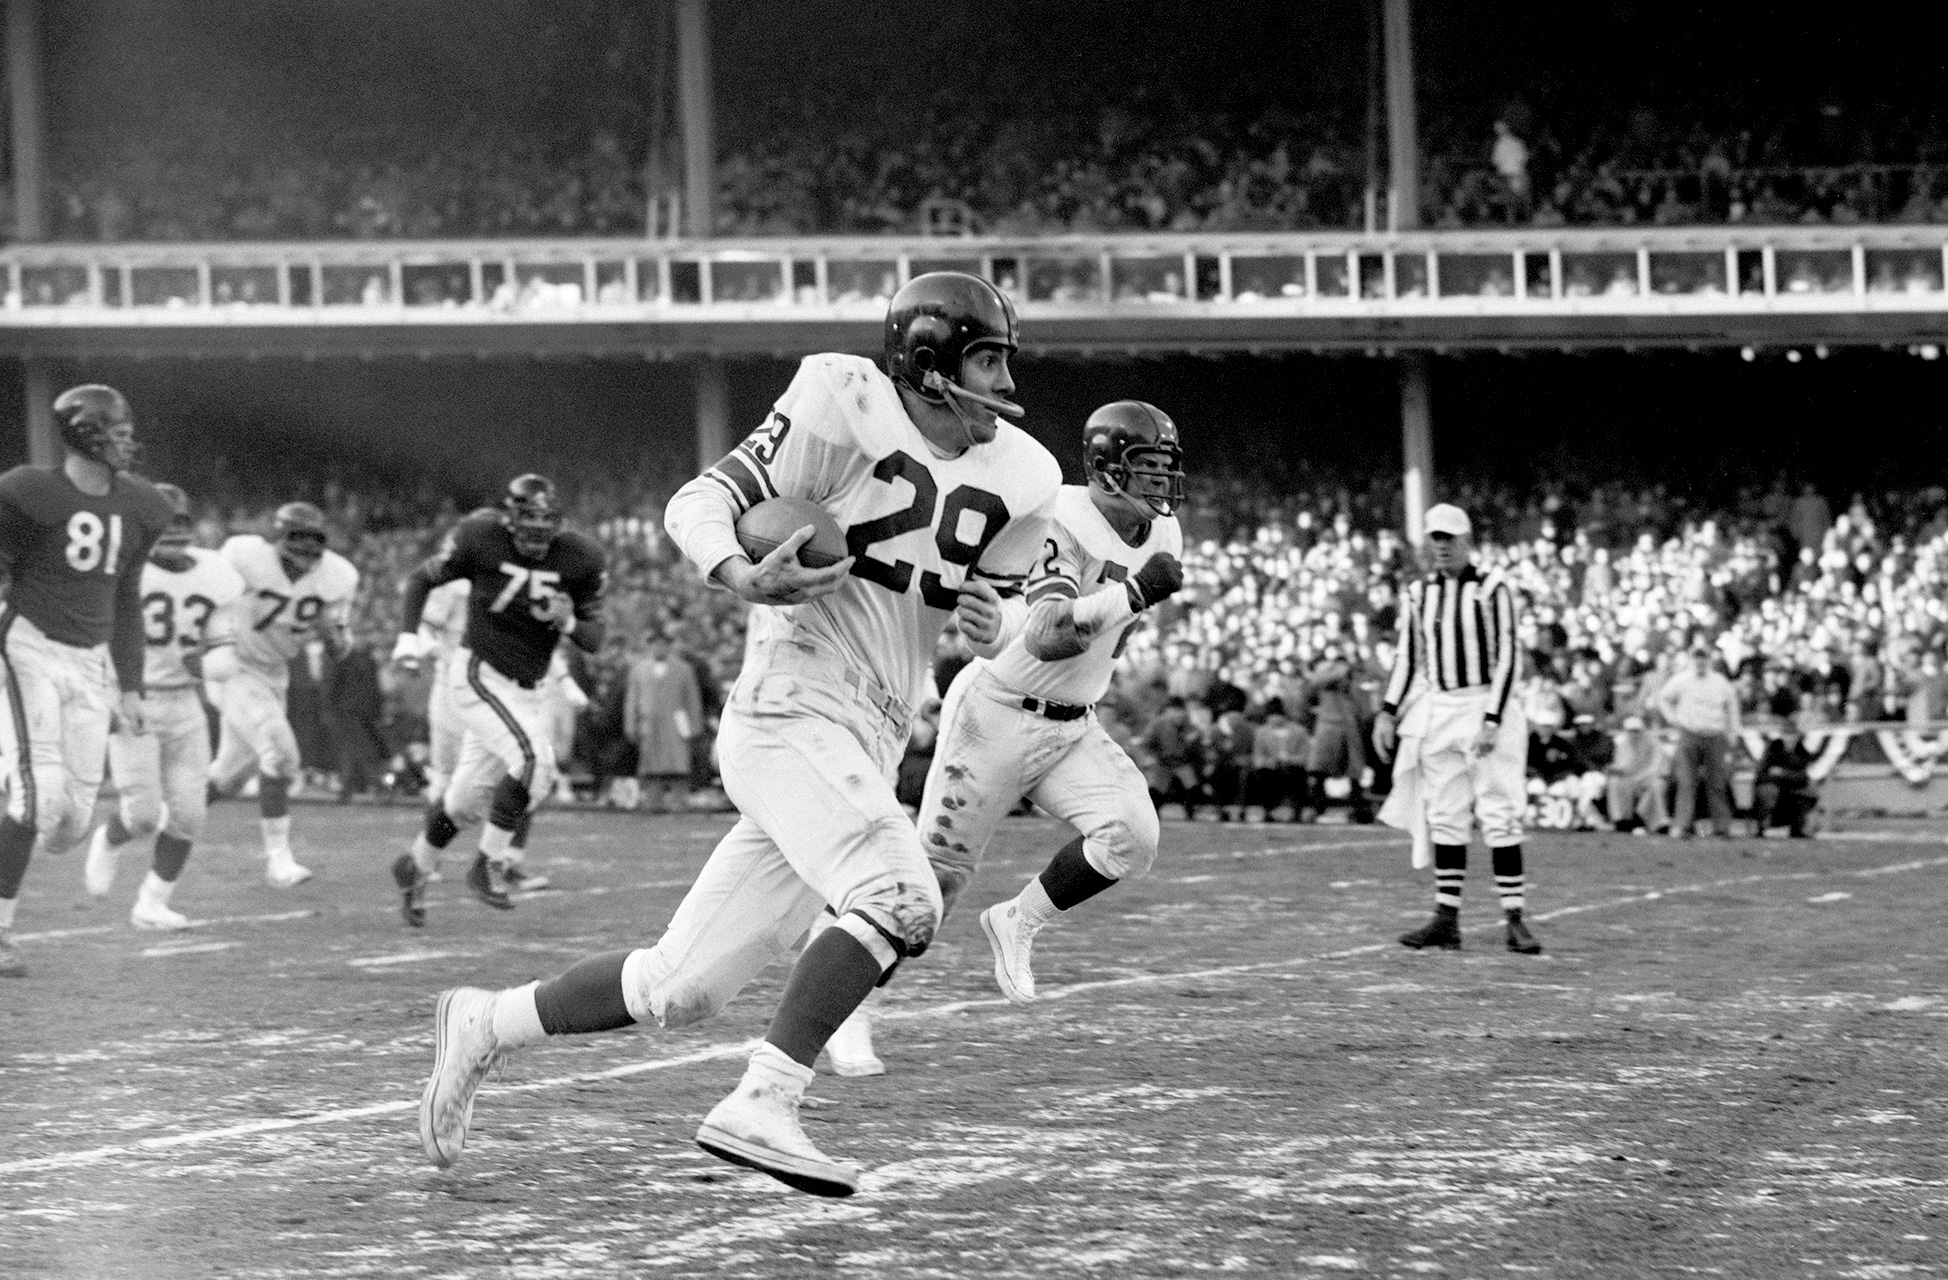 1956 NFL CHAMPIONSHIP GAME